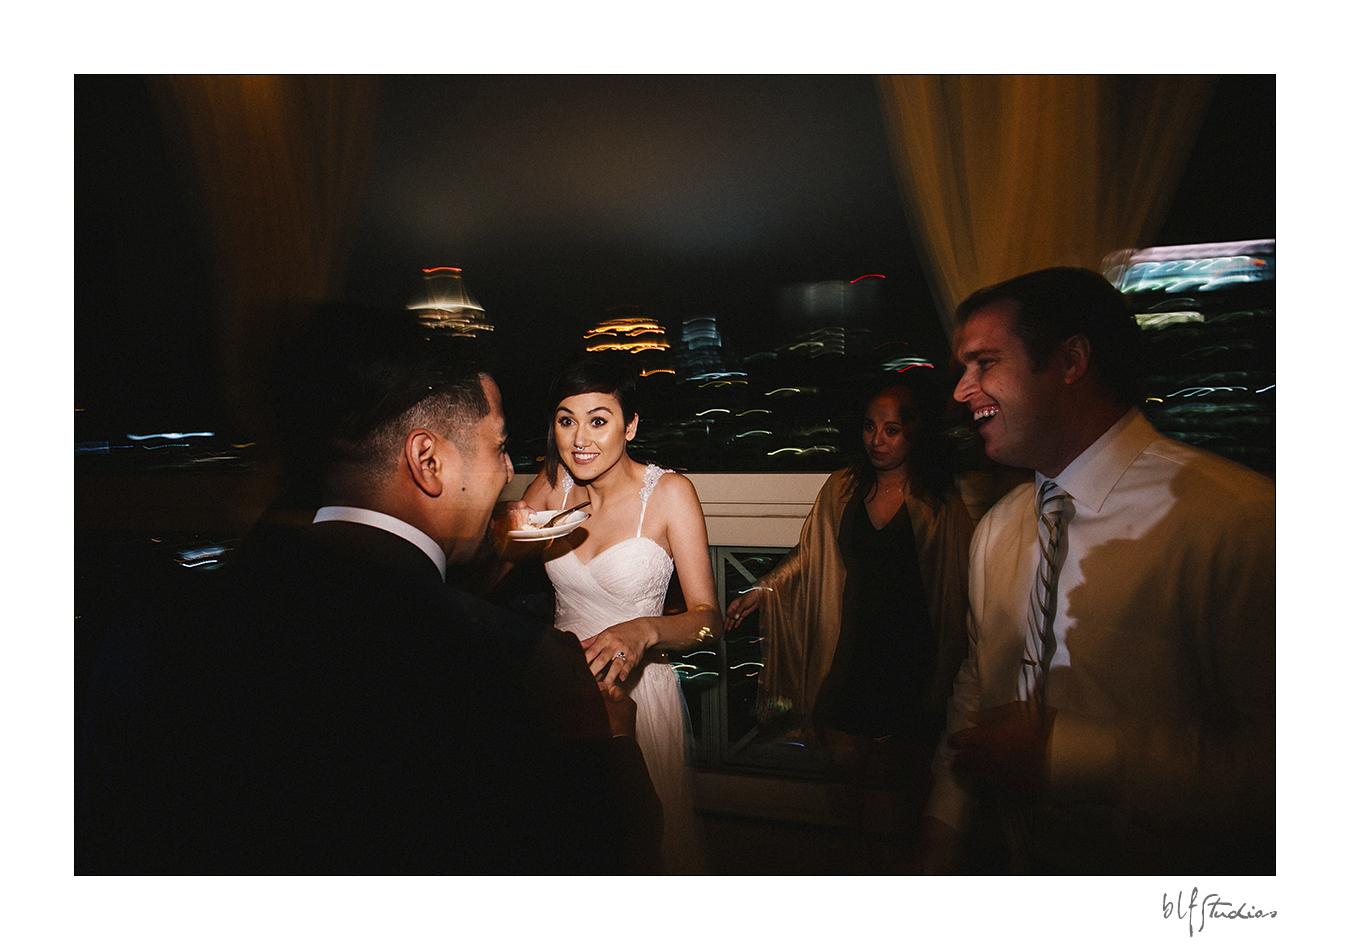 0048-blfstudios-wedding-photographer-daniel-danielle-atlanta.jpg